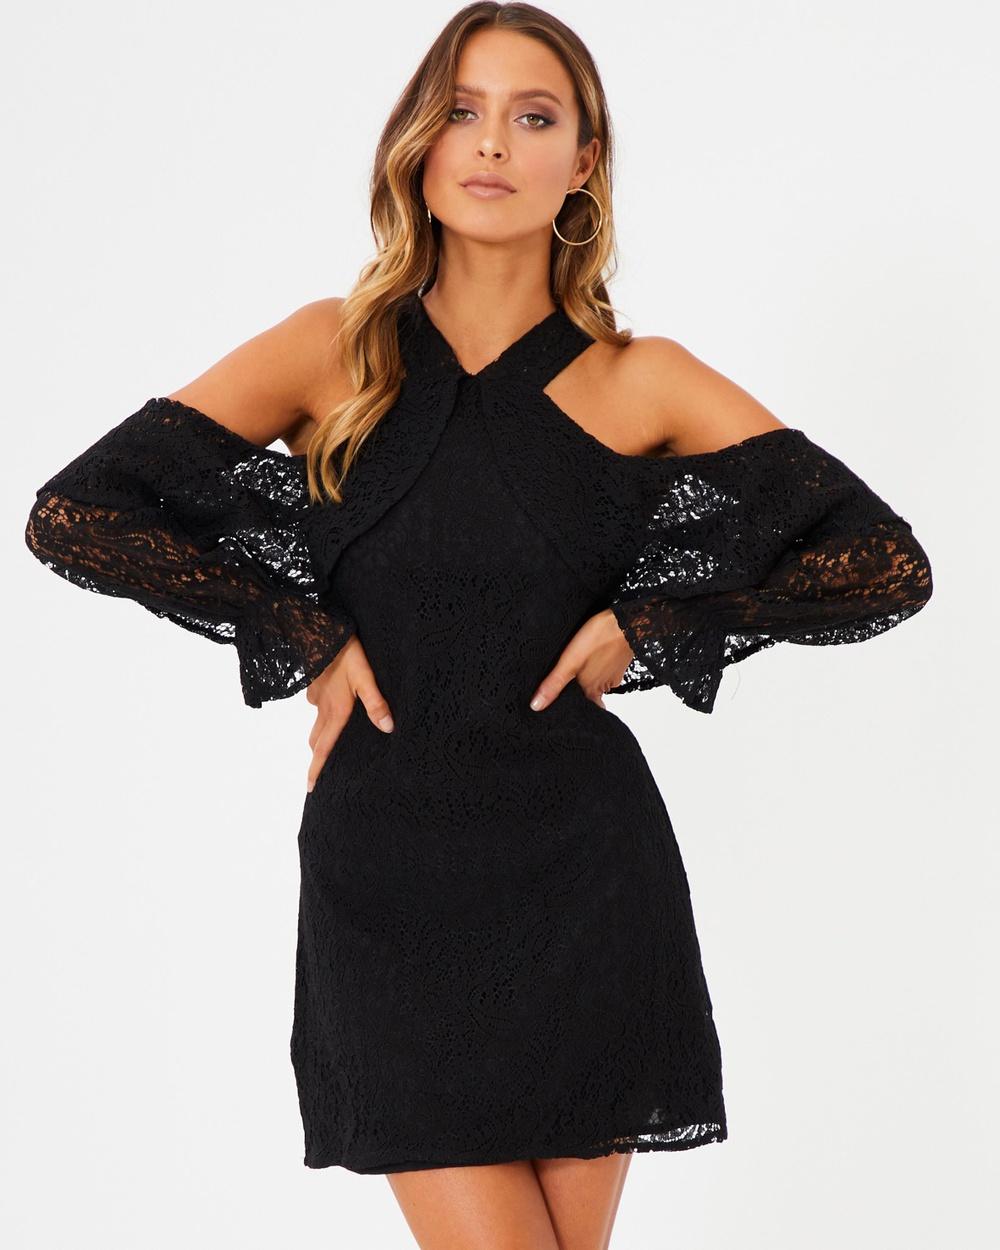 Photo of Tussah Black Carmela Mini Dress - beautiful dress from Tussah online